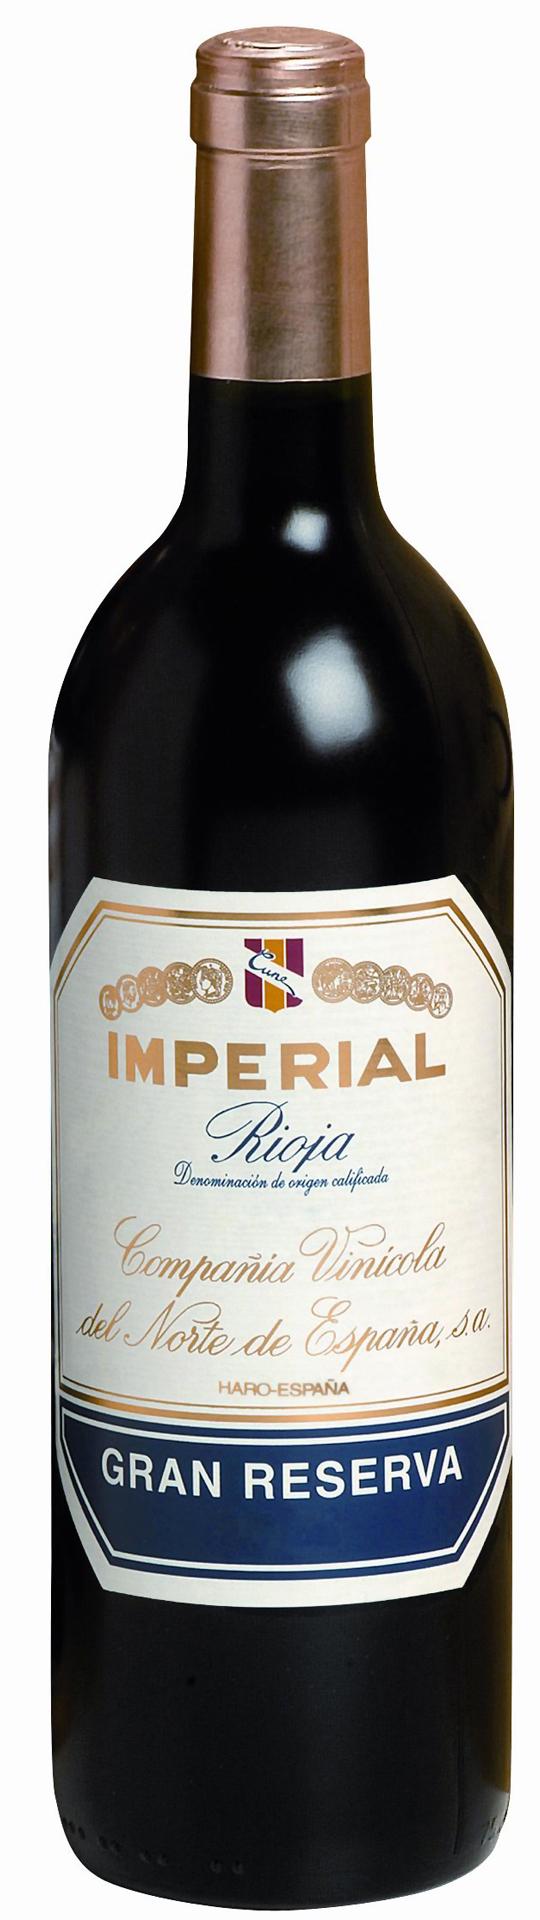 2001 CVNE Imperial Reserva Rioja фото